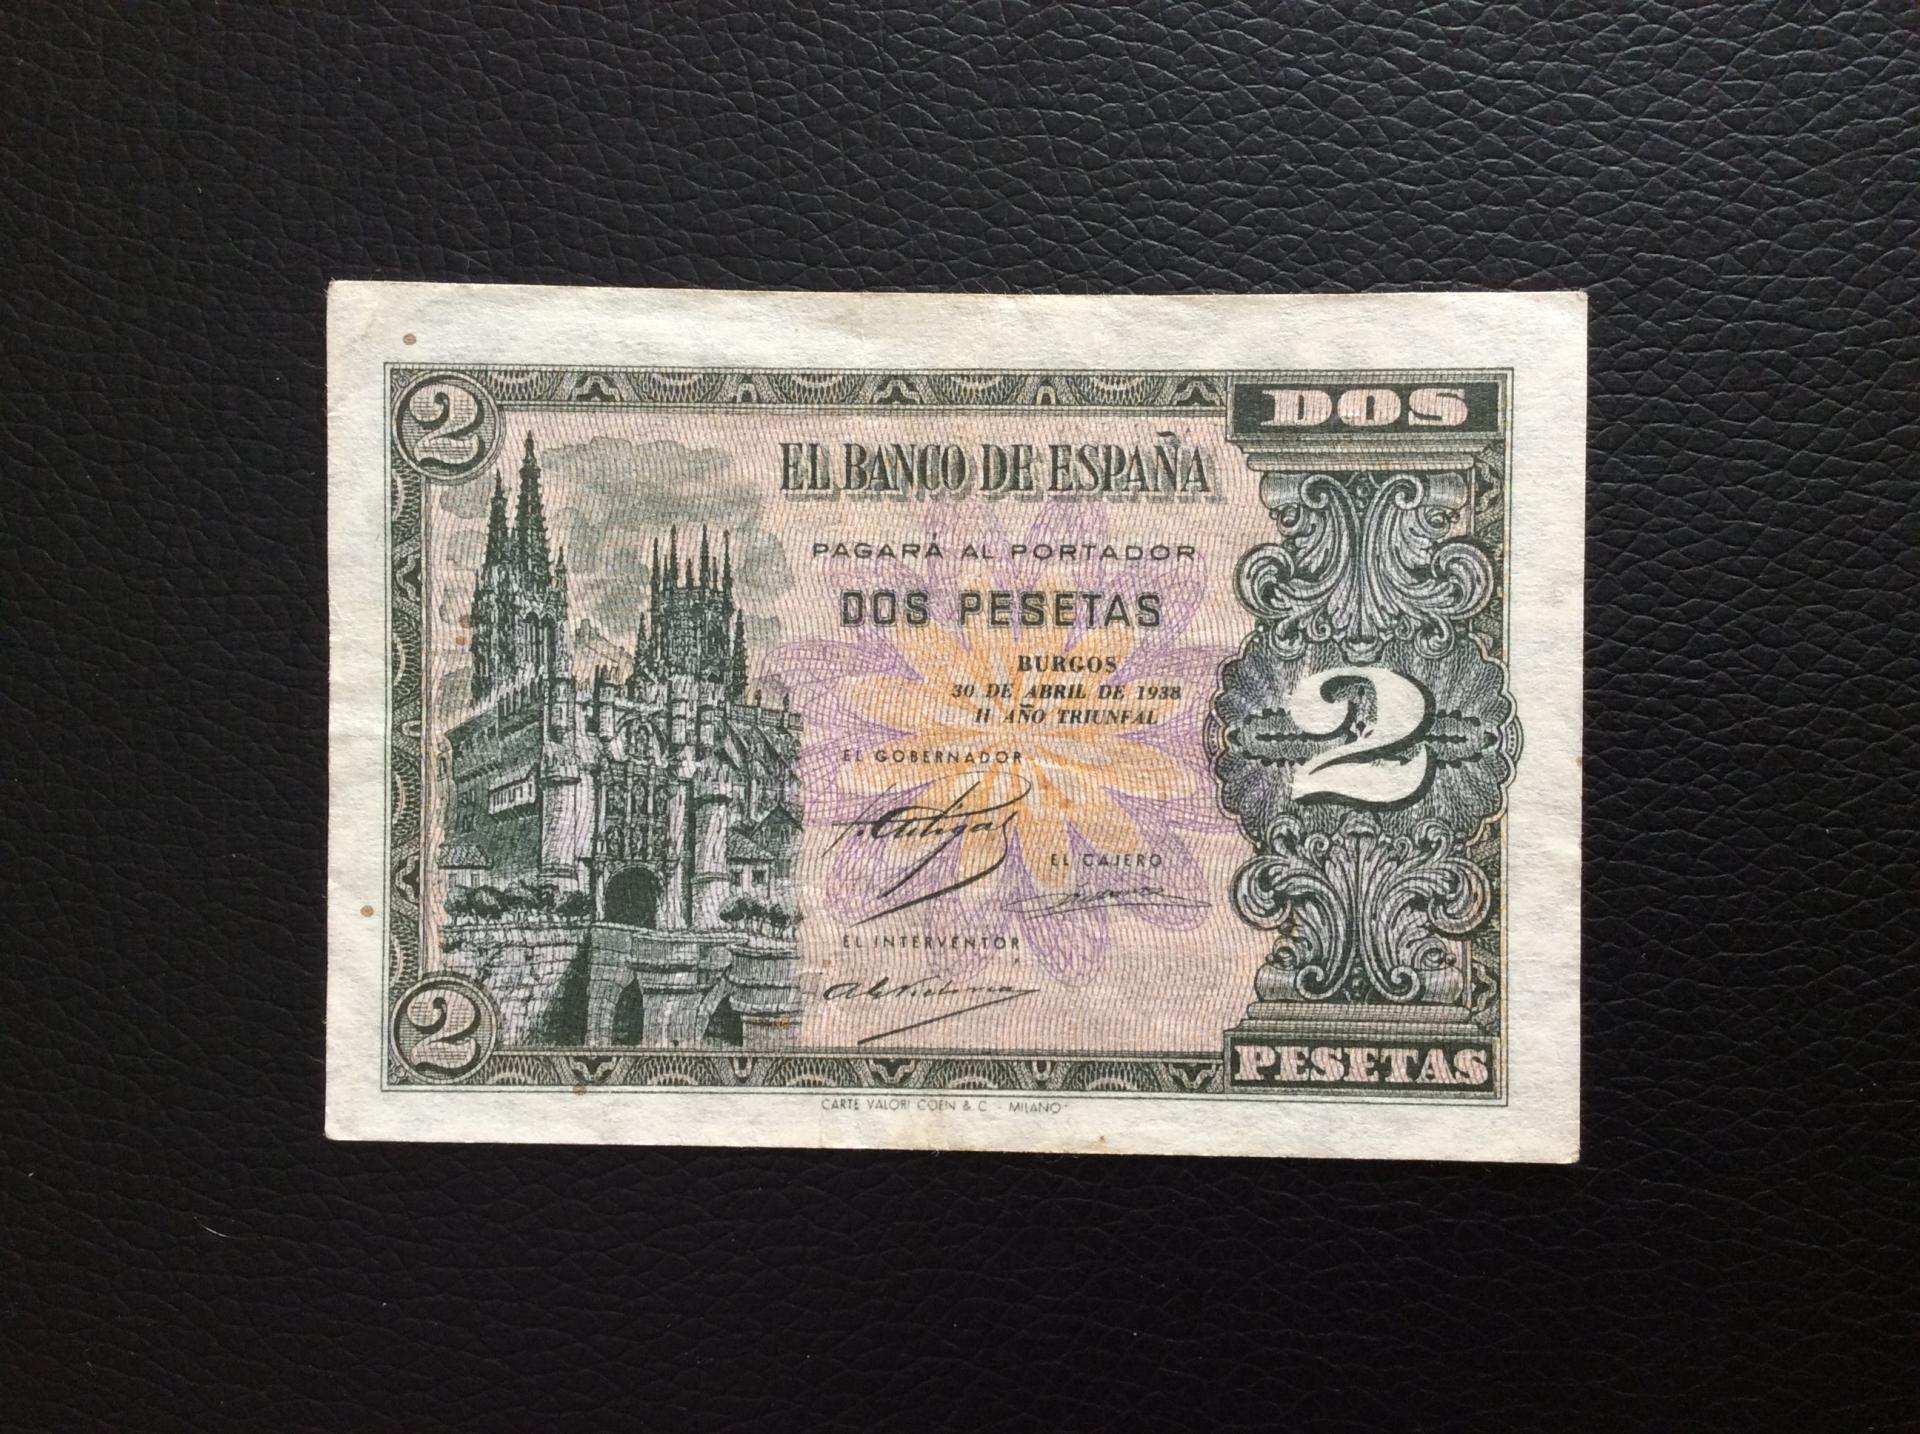 2 PESETAS ABRIL 1938 - BURGOS - MUY BUENA CONSERVACIÓN